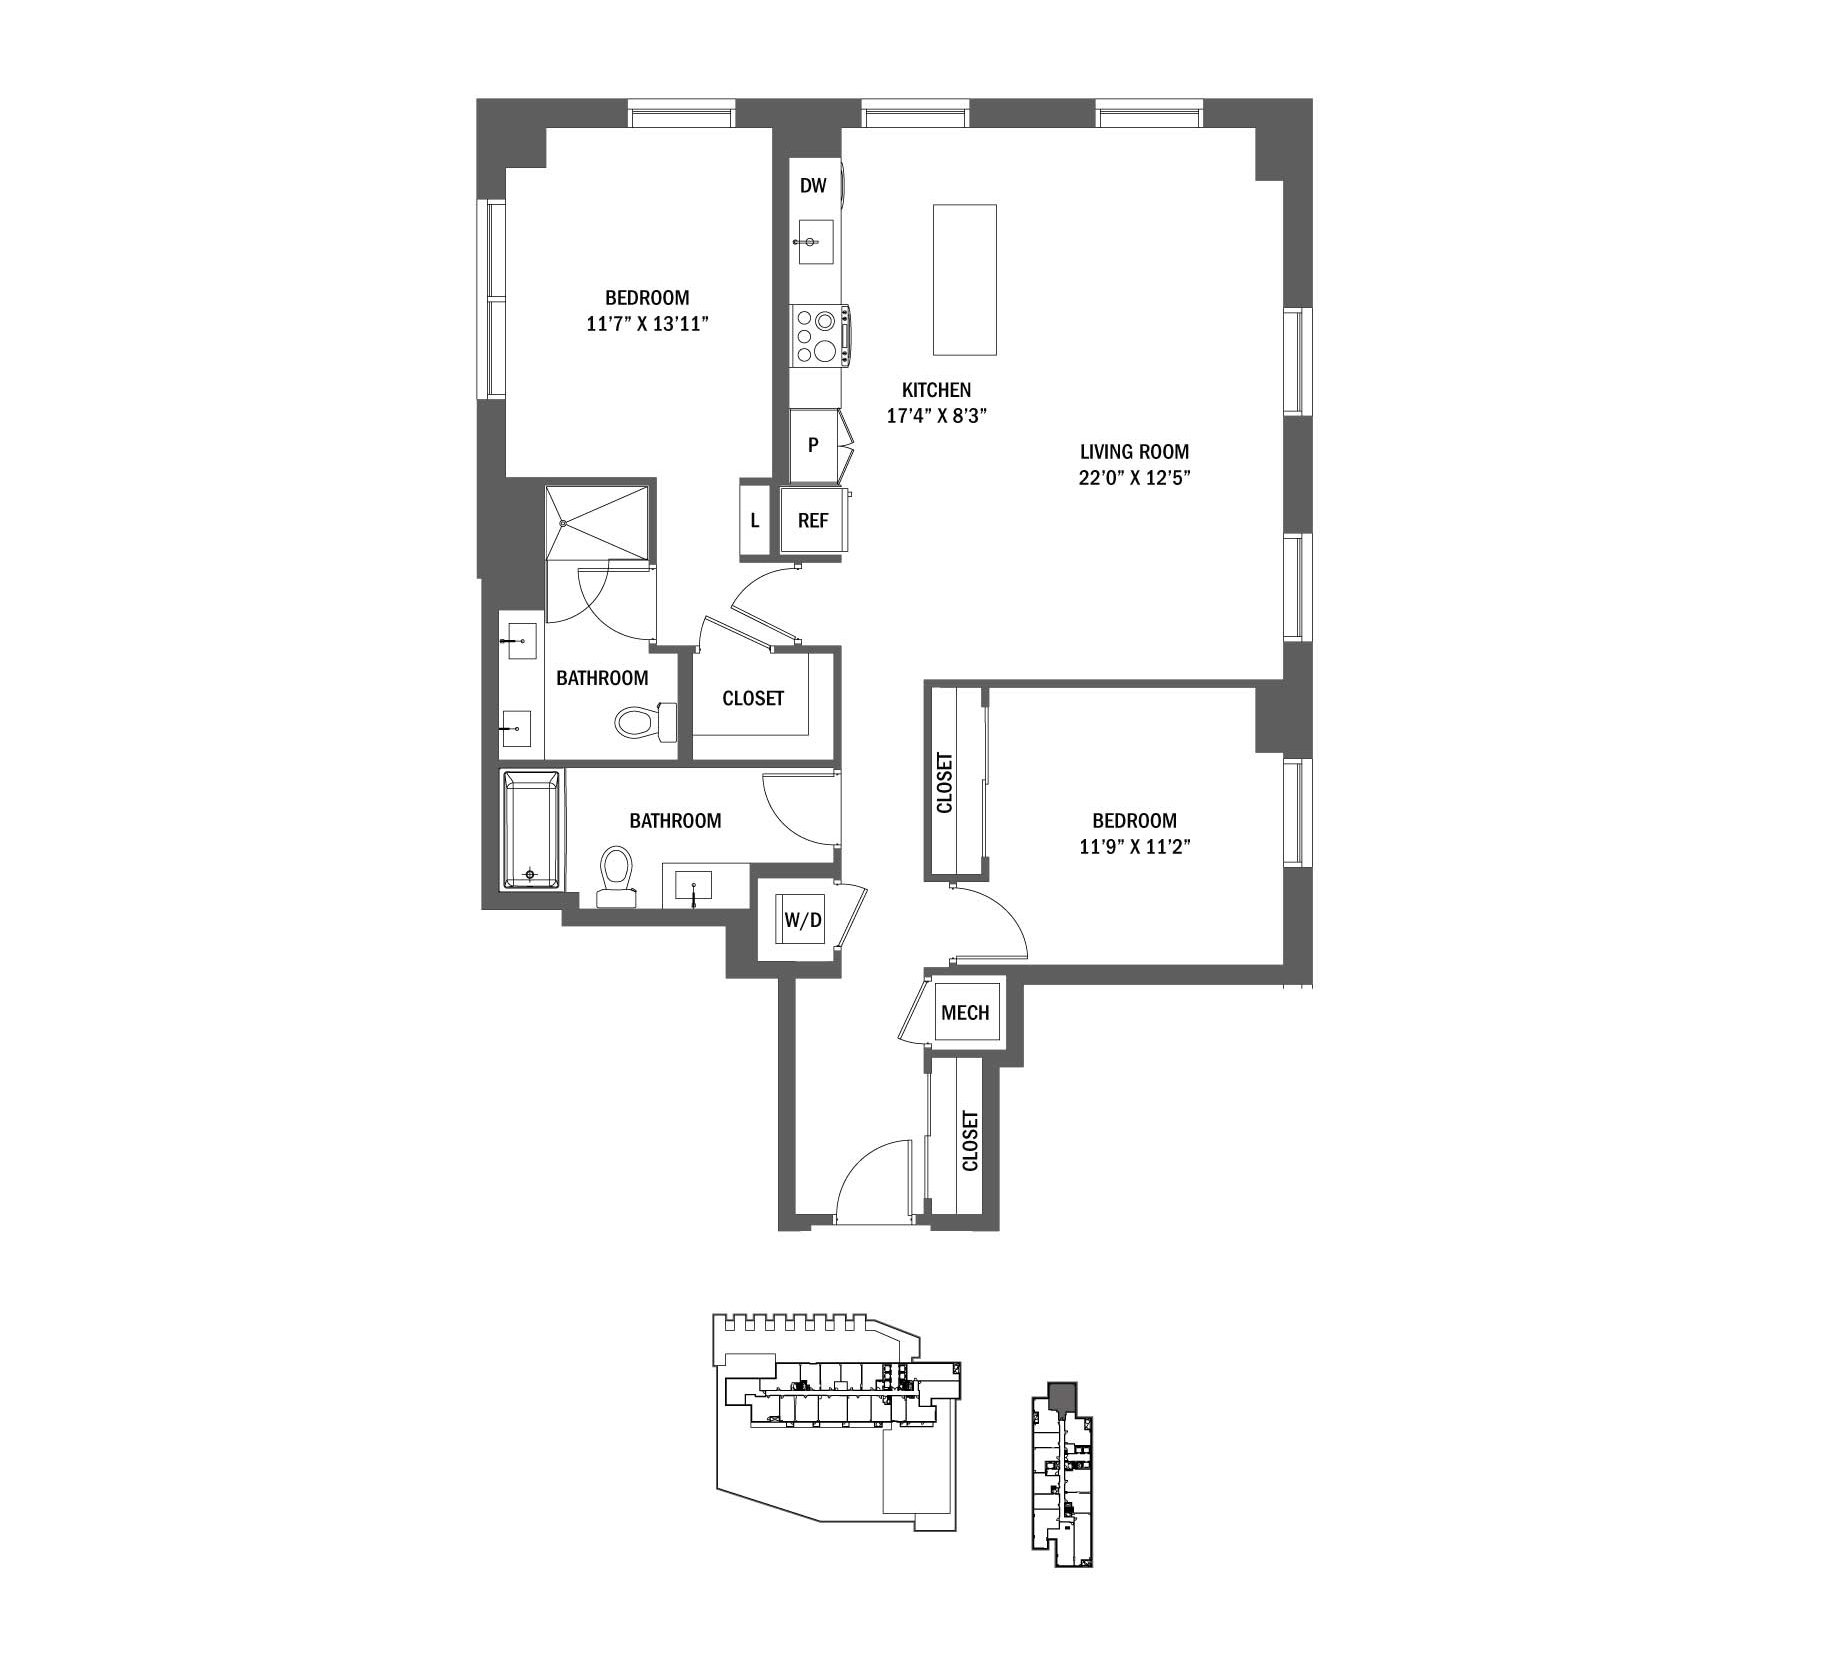 P0625338 789bc10 e02 typ 2 floorplan